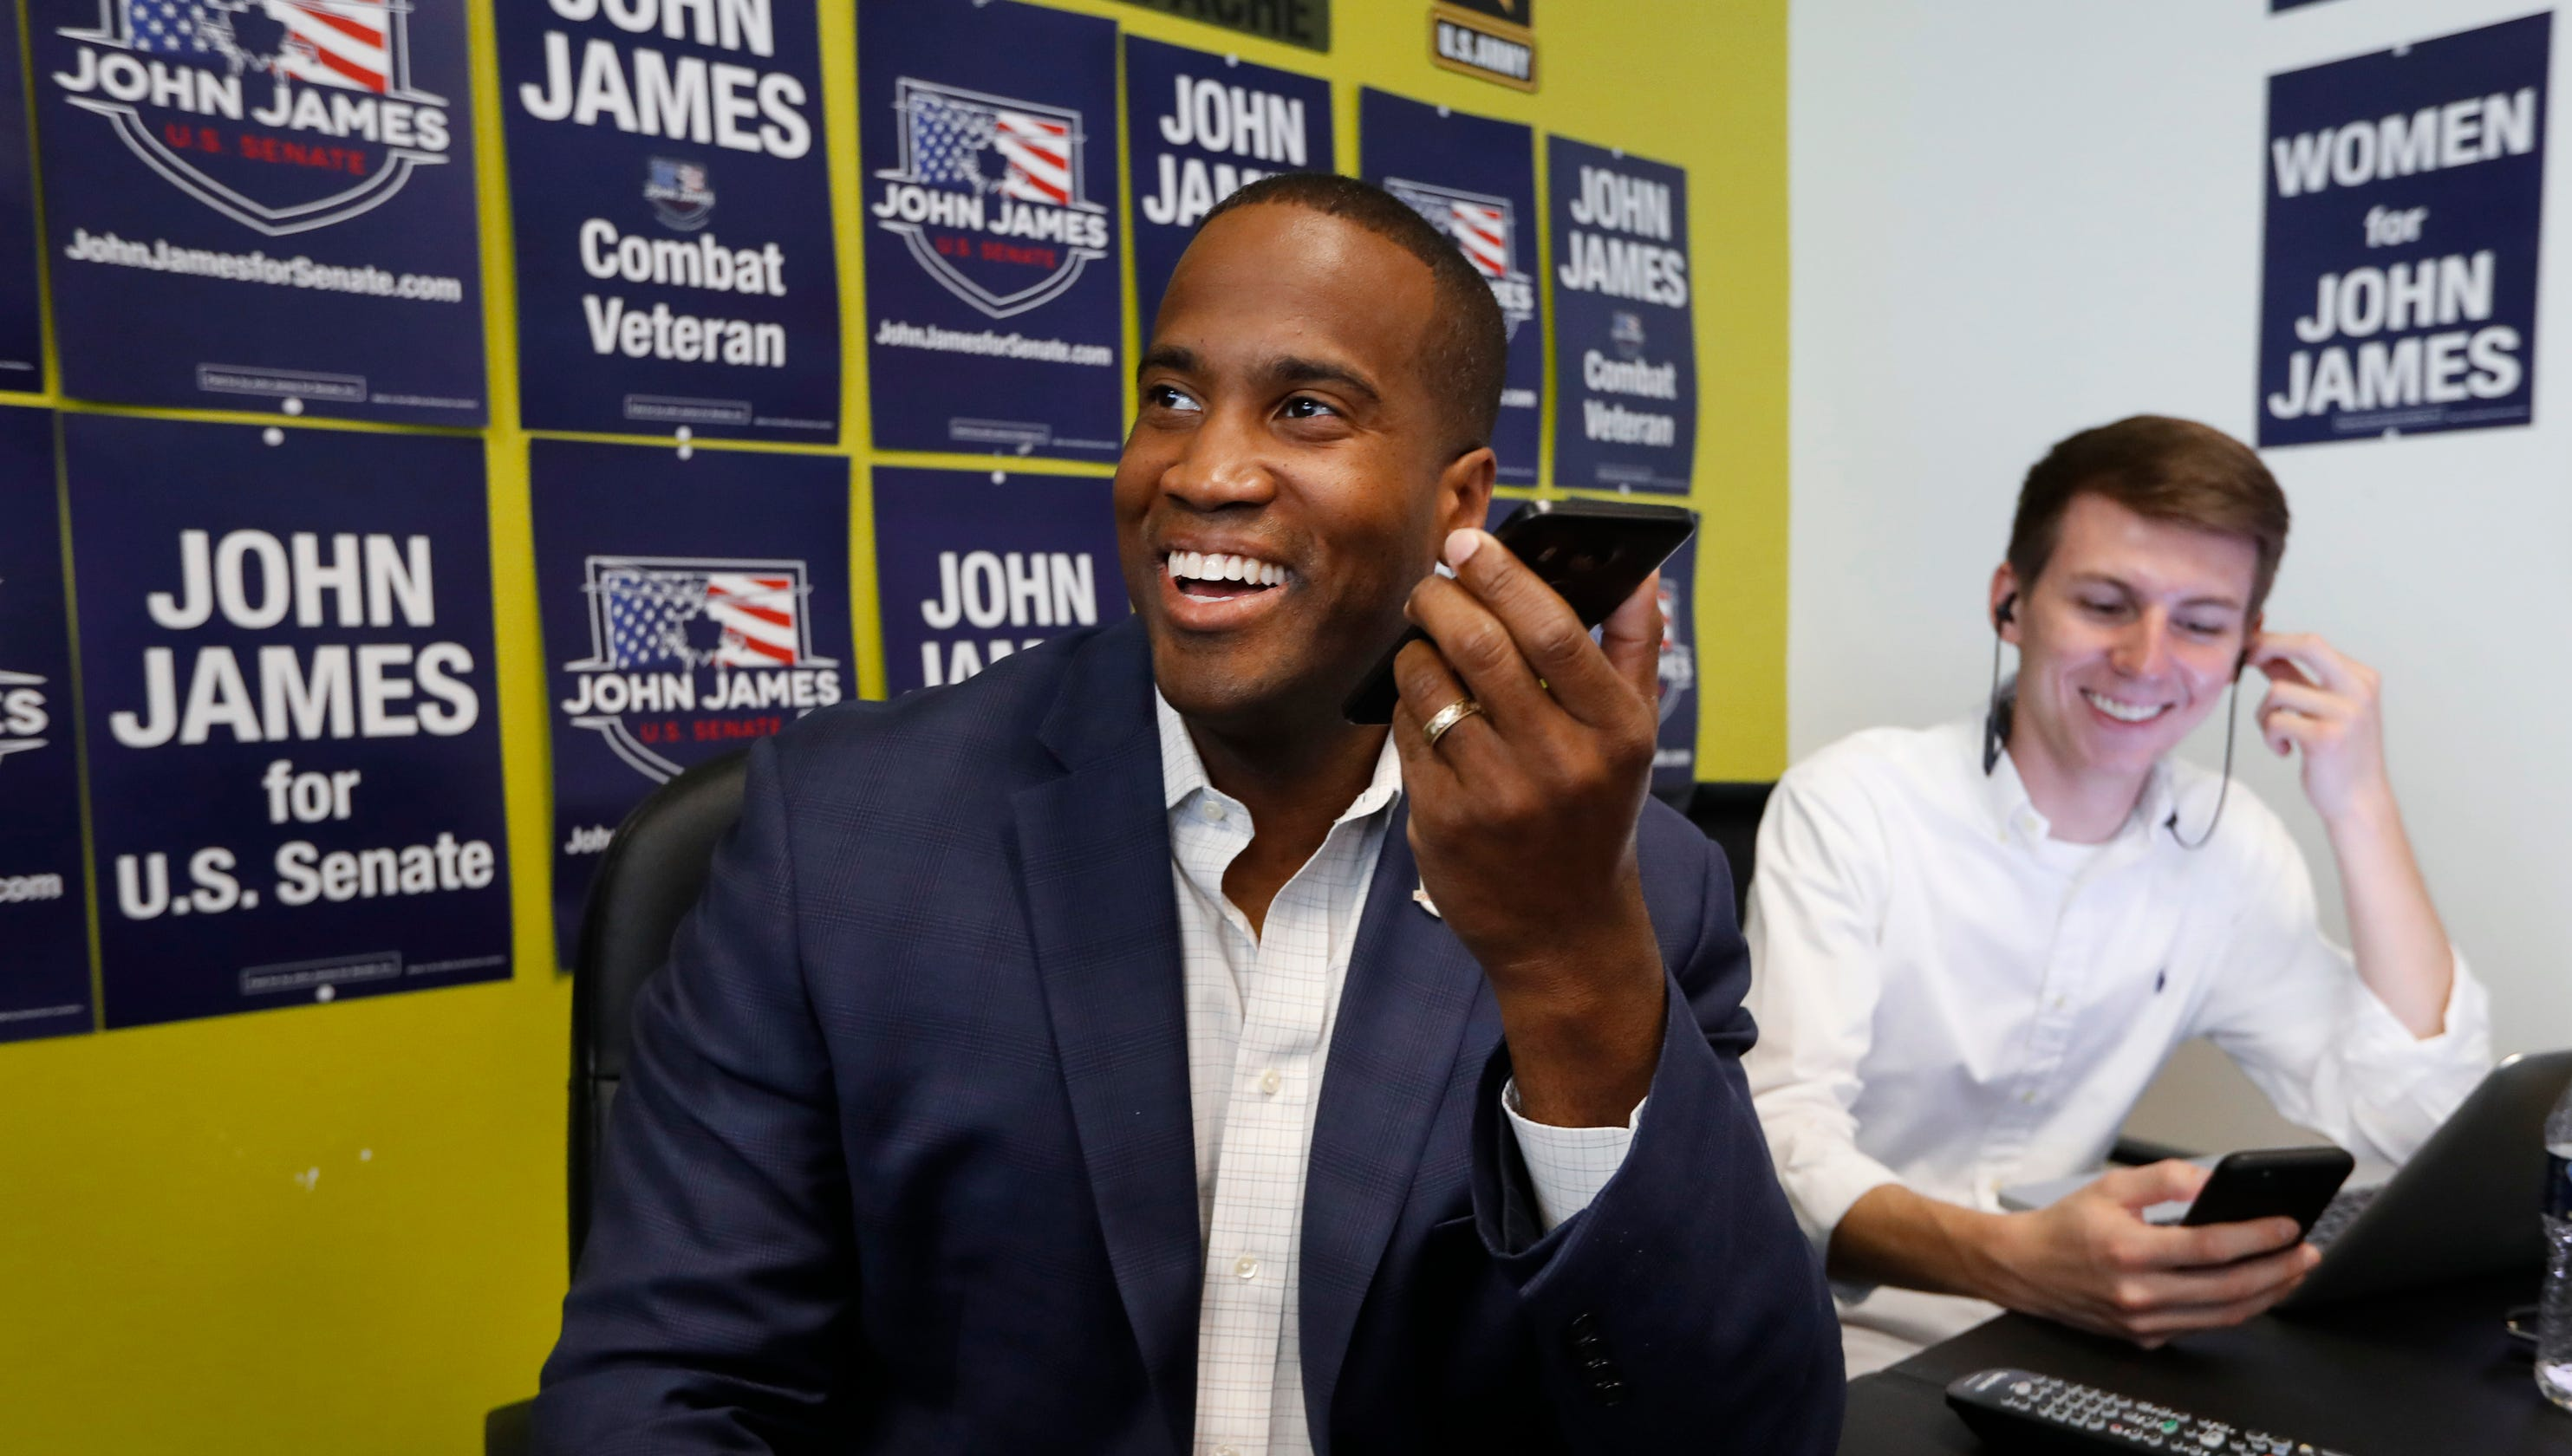 Senate candidate John James donates $1M portion of campaign donations